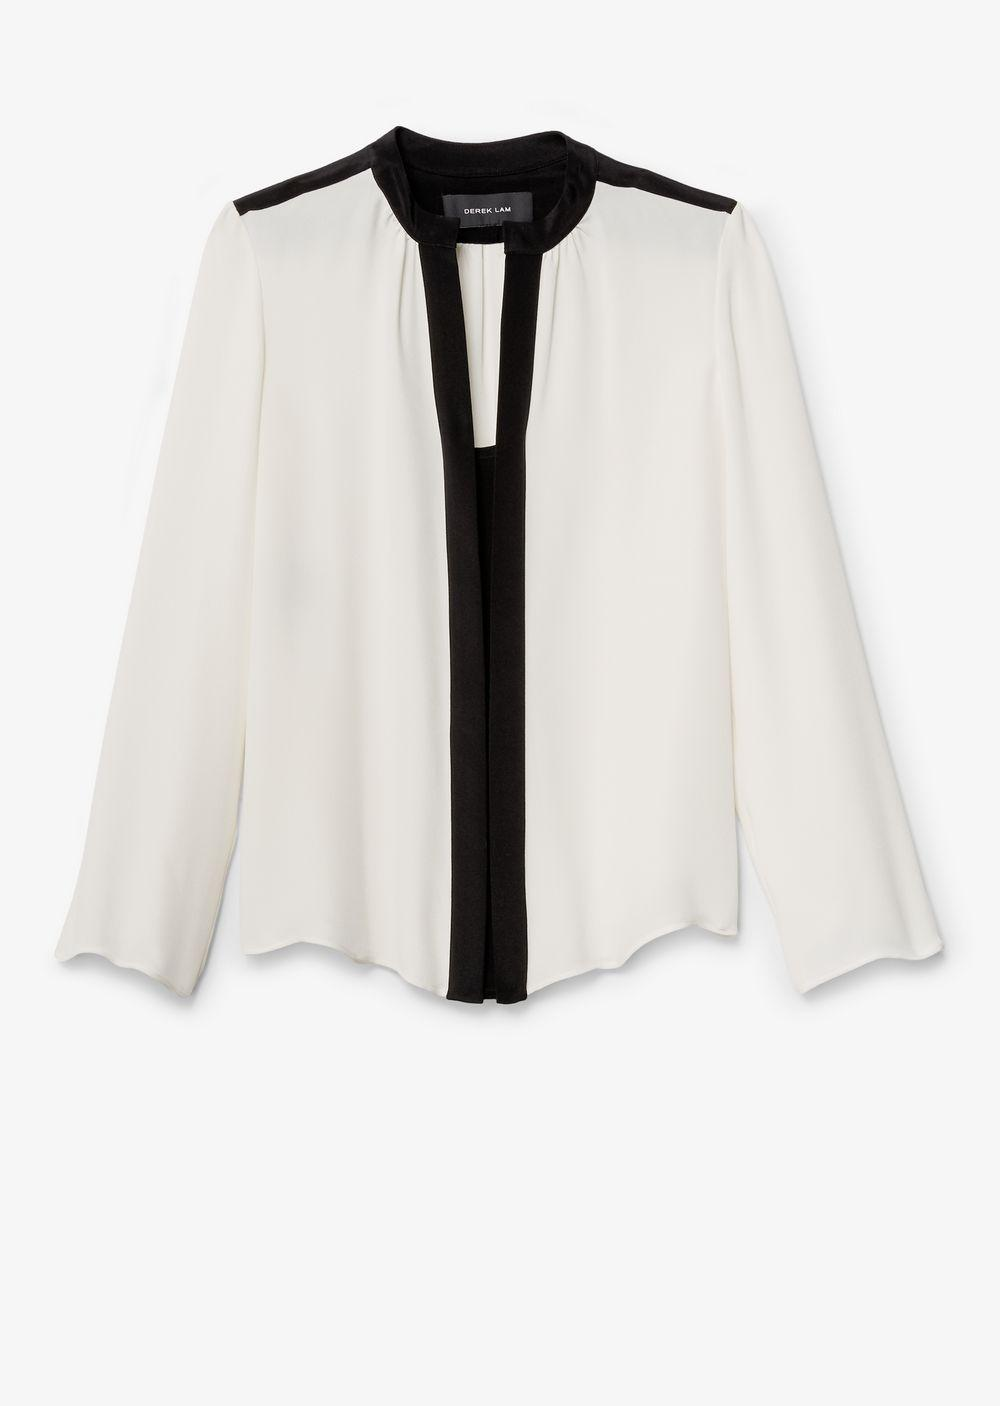 9920f8e55b8da5 Derek Lam - White Long Sleeve Blouse With Nehru Collar - Lyst. View  fullscreen